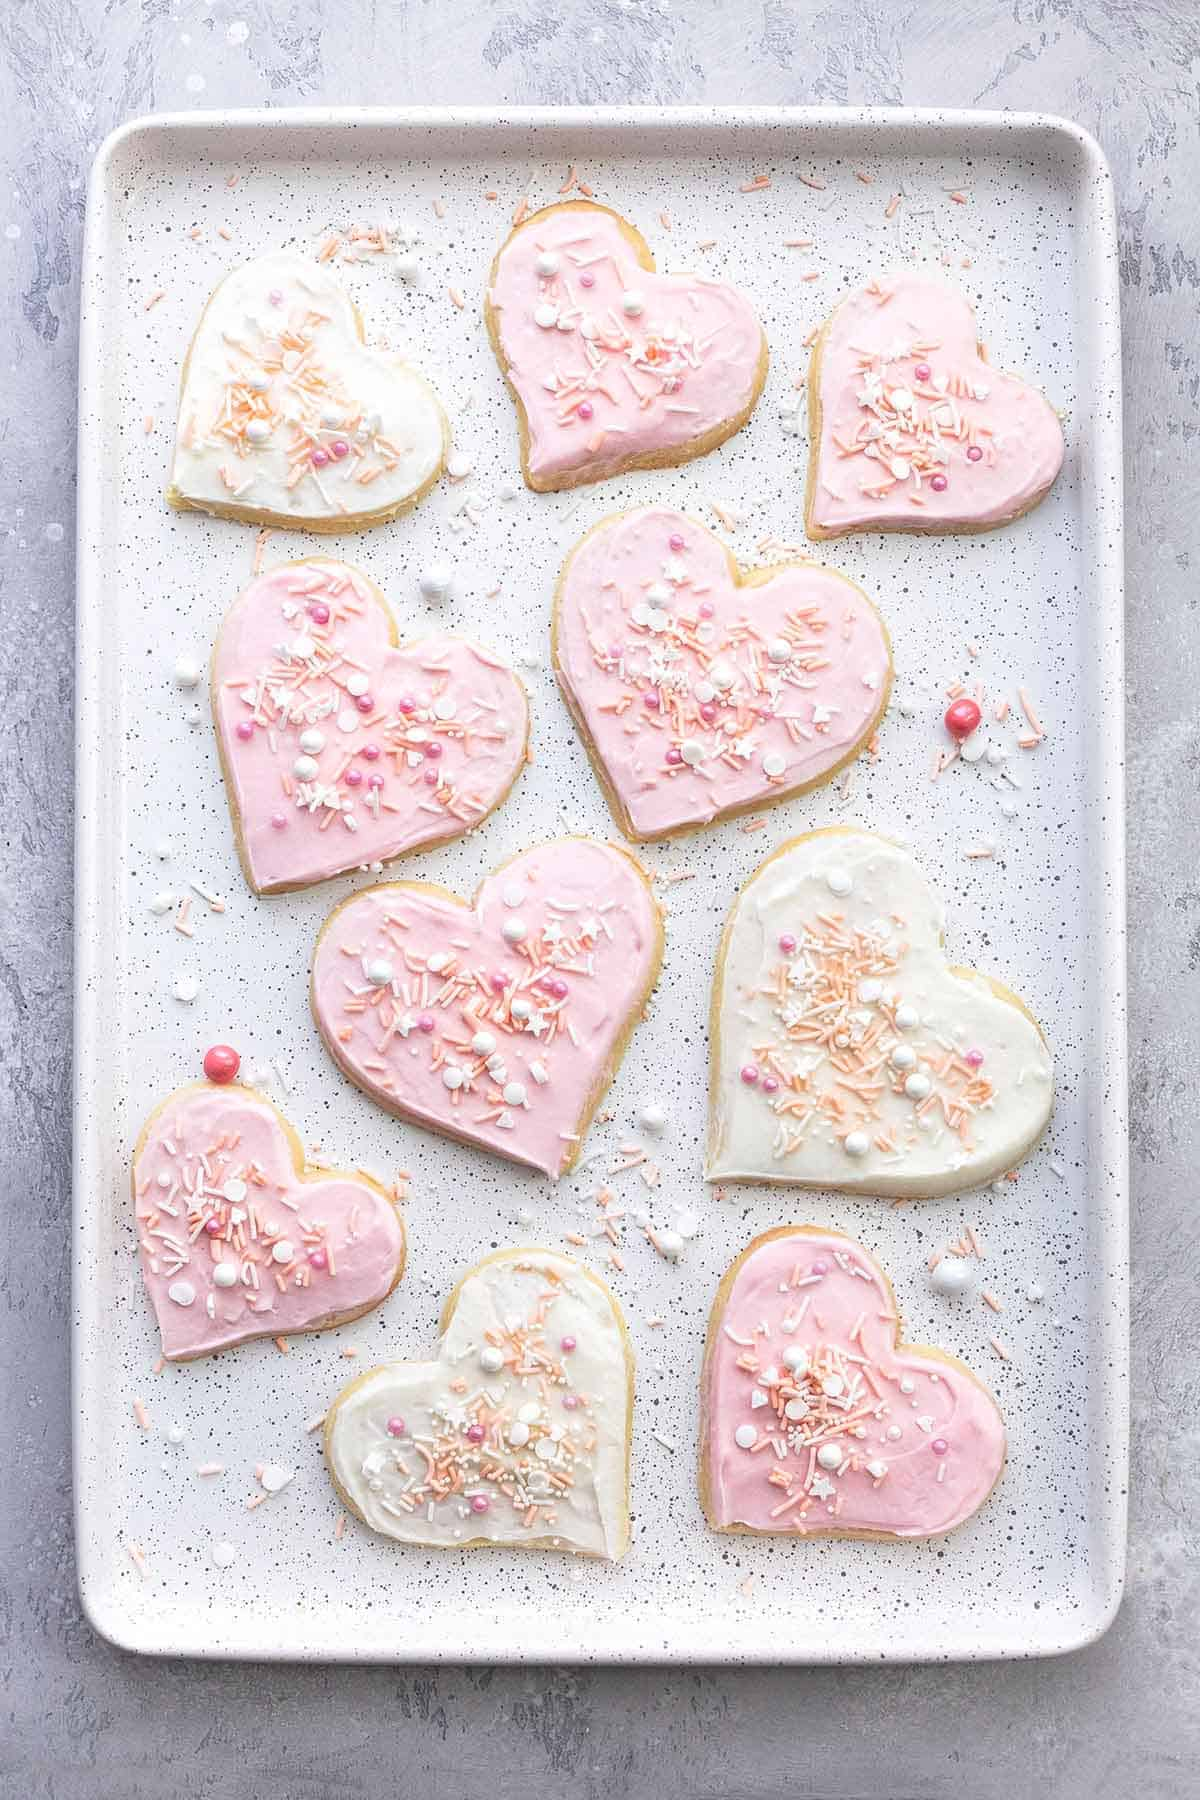 sugar cookies with sprinkles on a baking pan